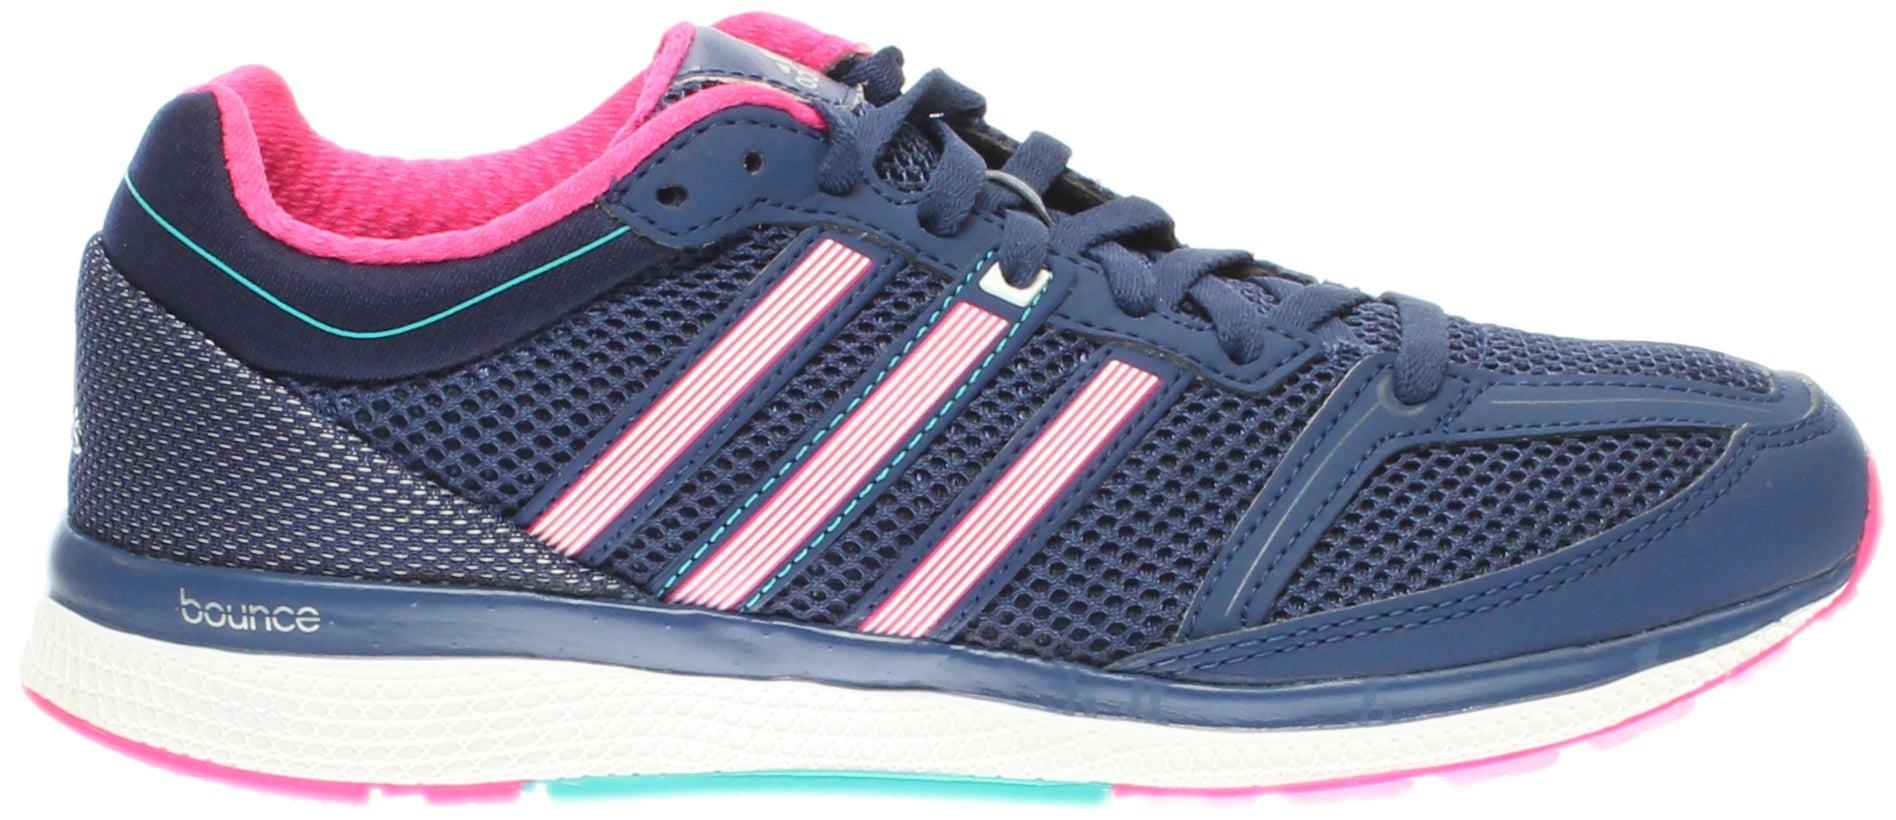 adidas Mana RC Bounce Blue - Womens  - Size